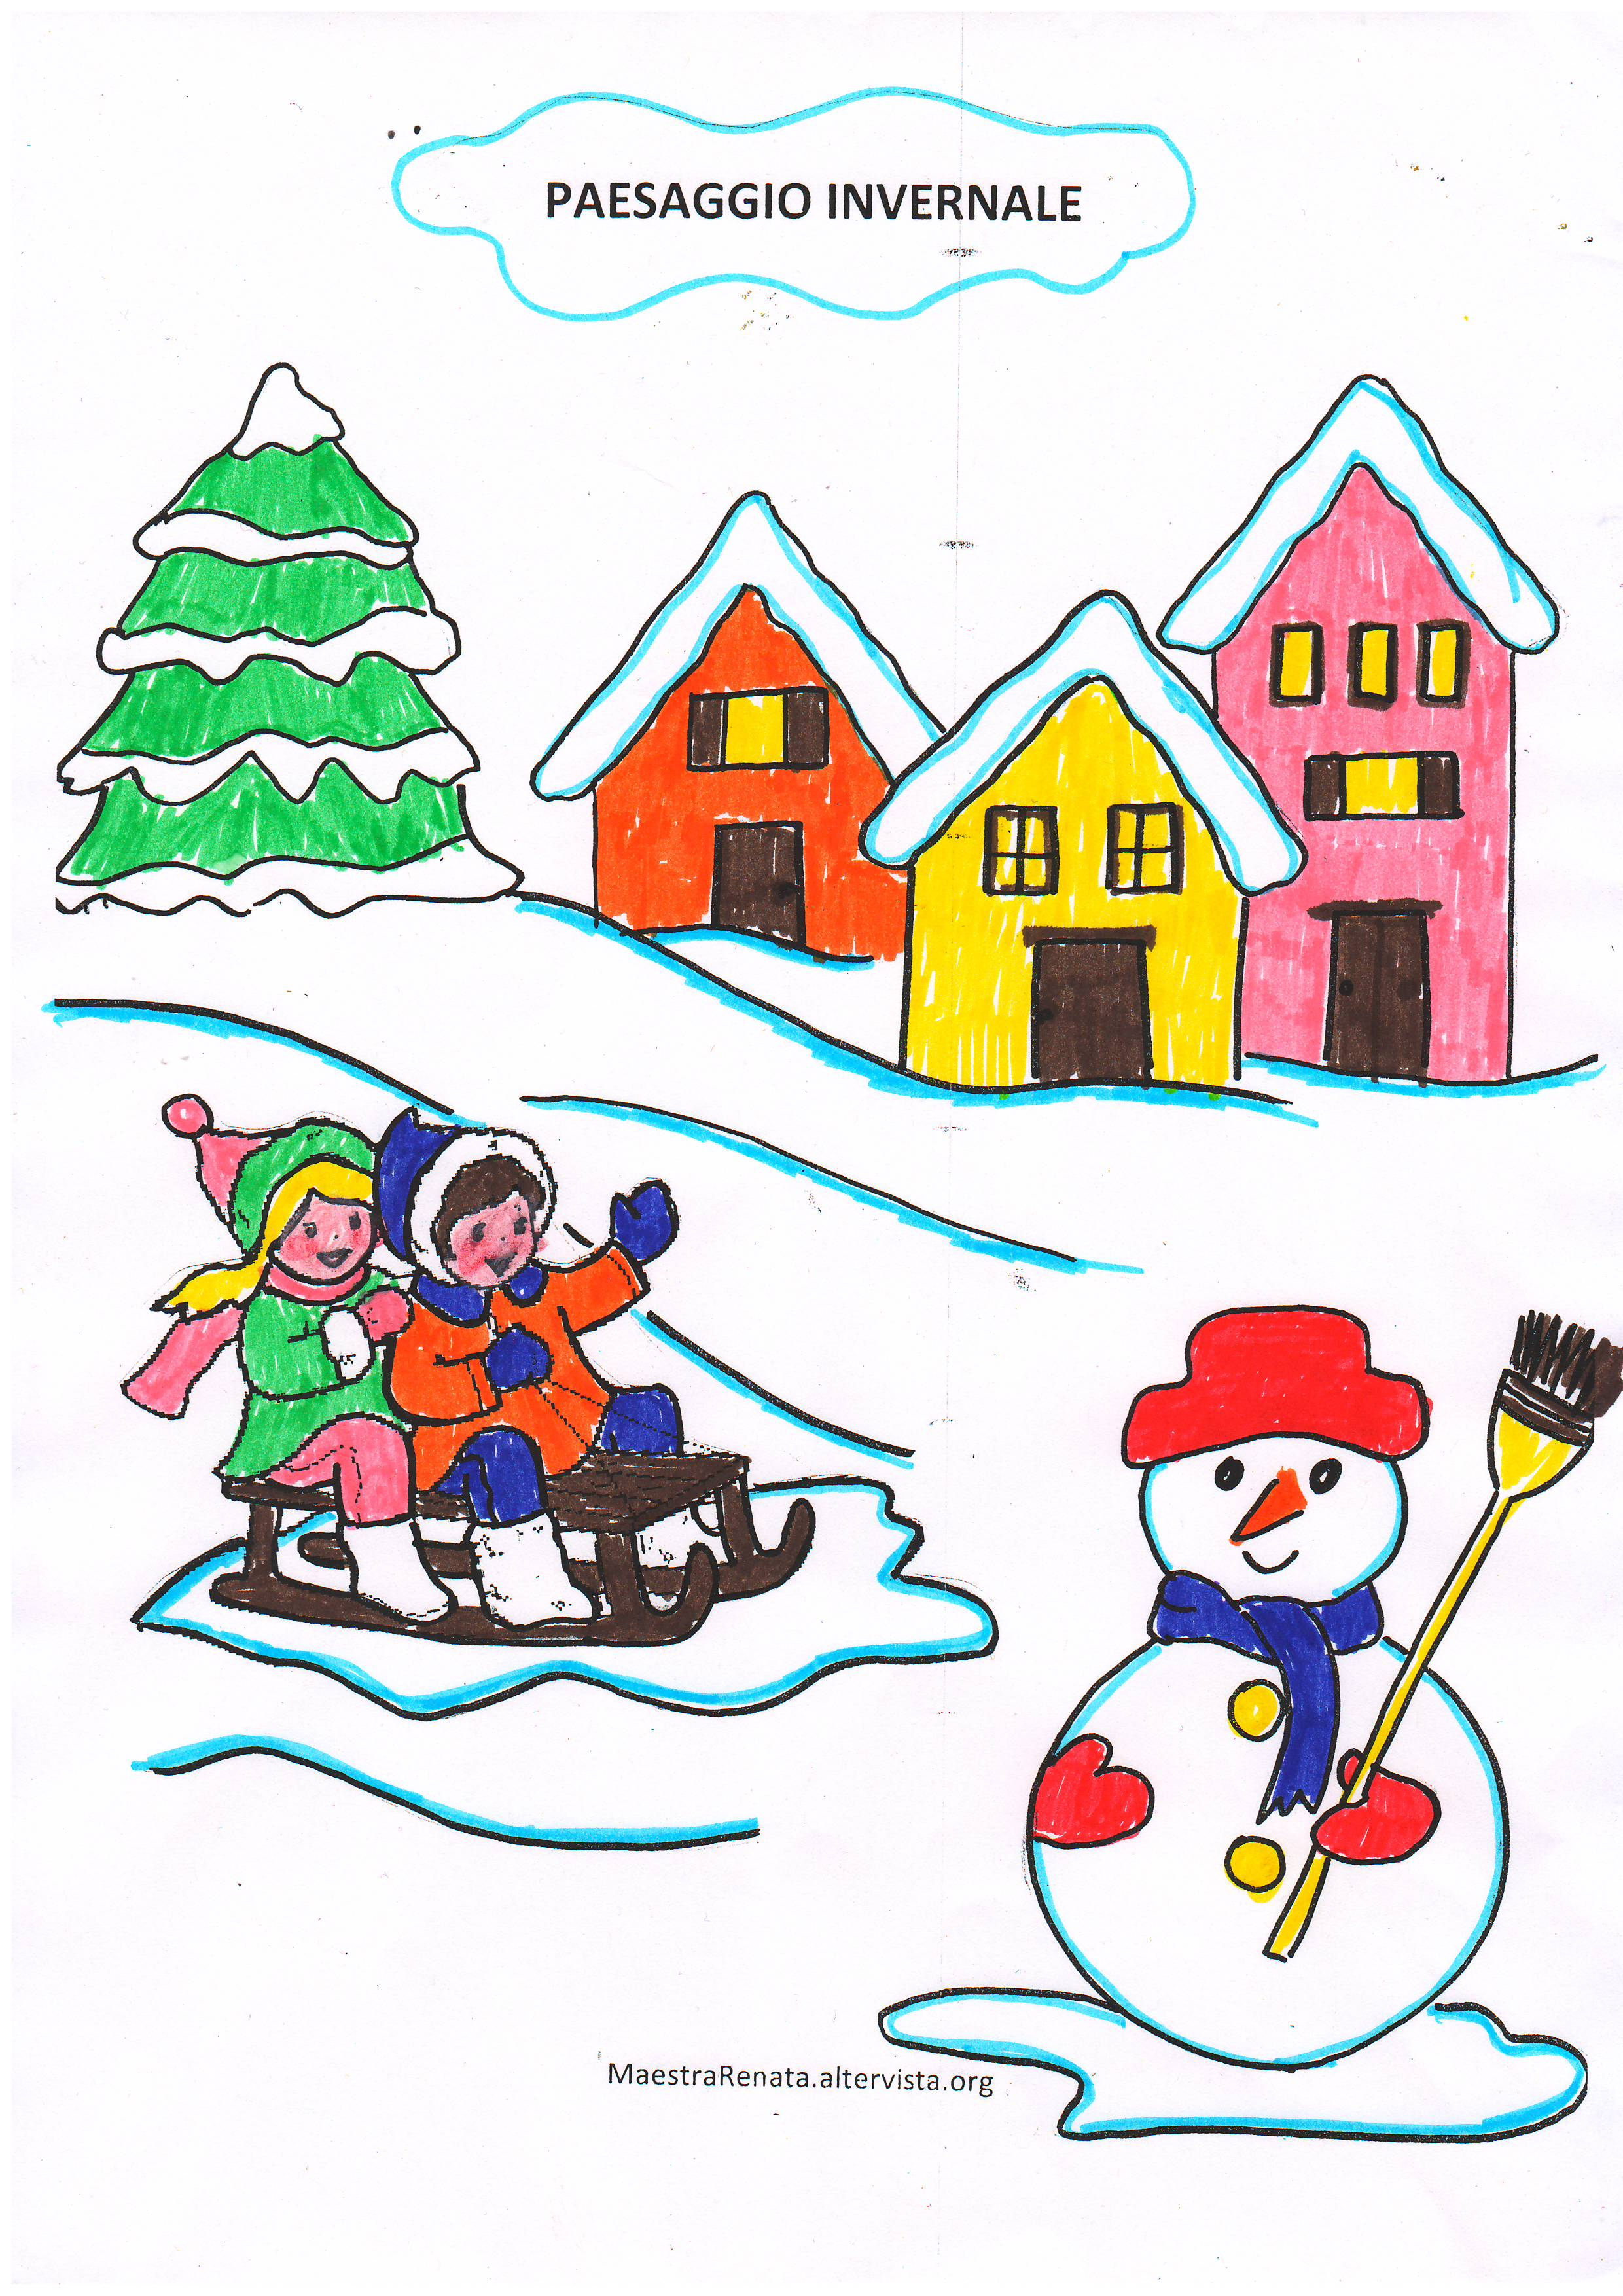 Lapbook inverno maestrarenata for Paesaggio invernale disegno